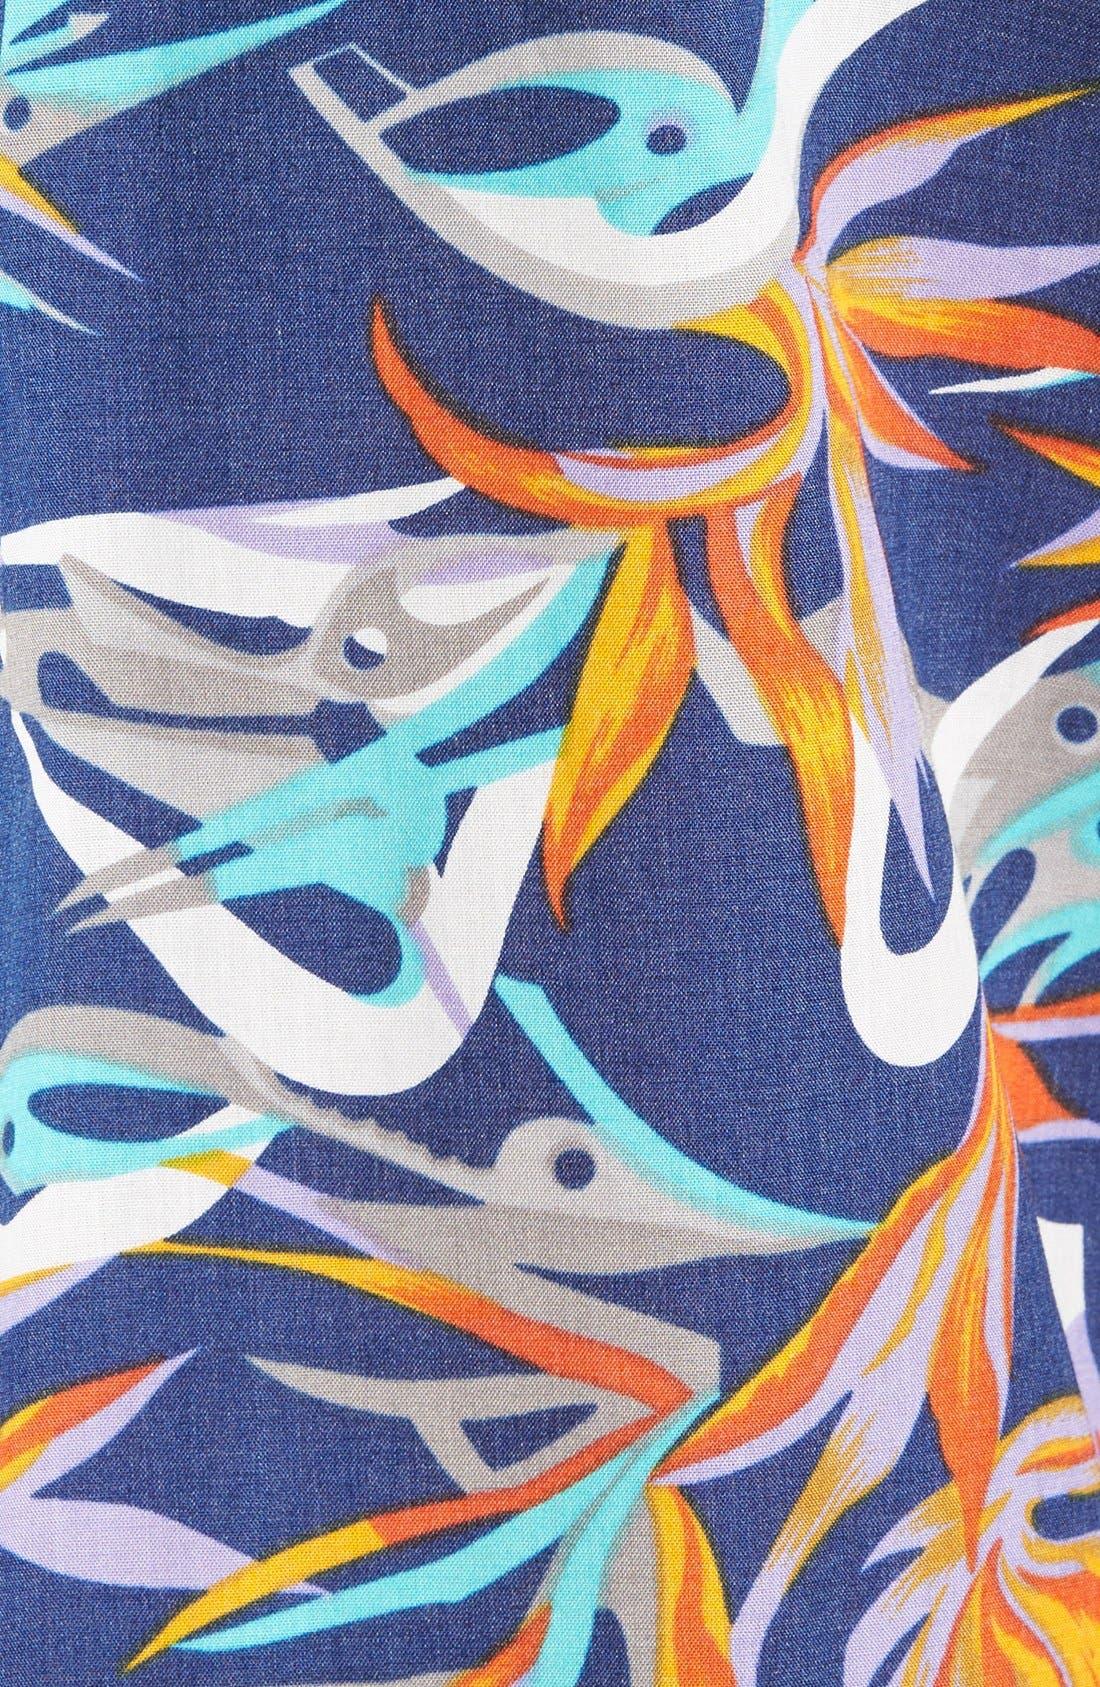 'Go To' Slim Fit Short Sleeve Sport Shirt,                             Alternate thumbnail 5, color,                             Piton Paradise/ Channel Blue